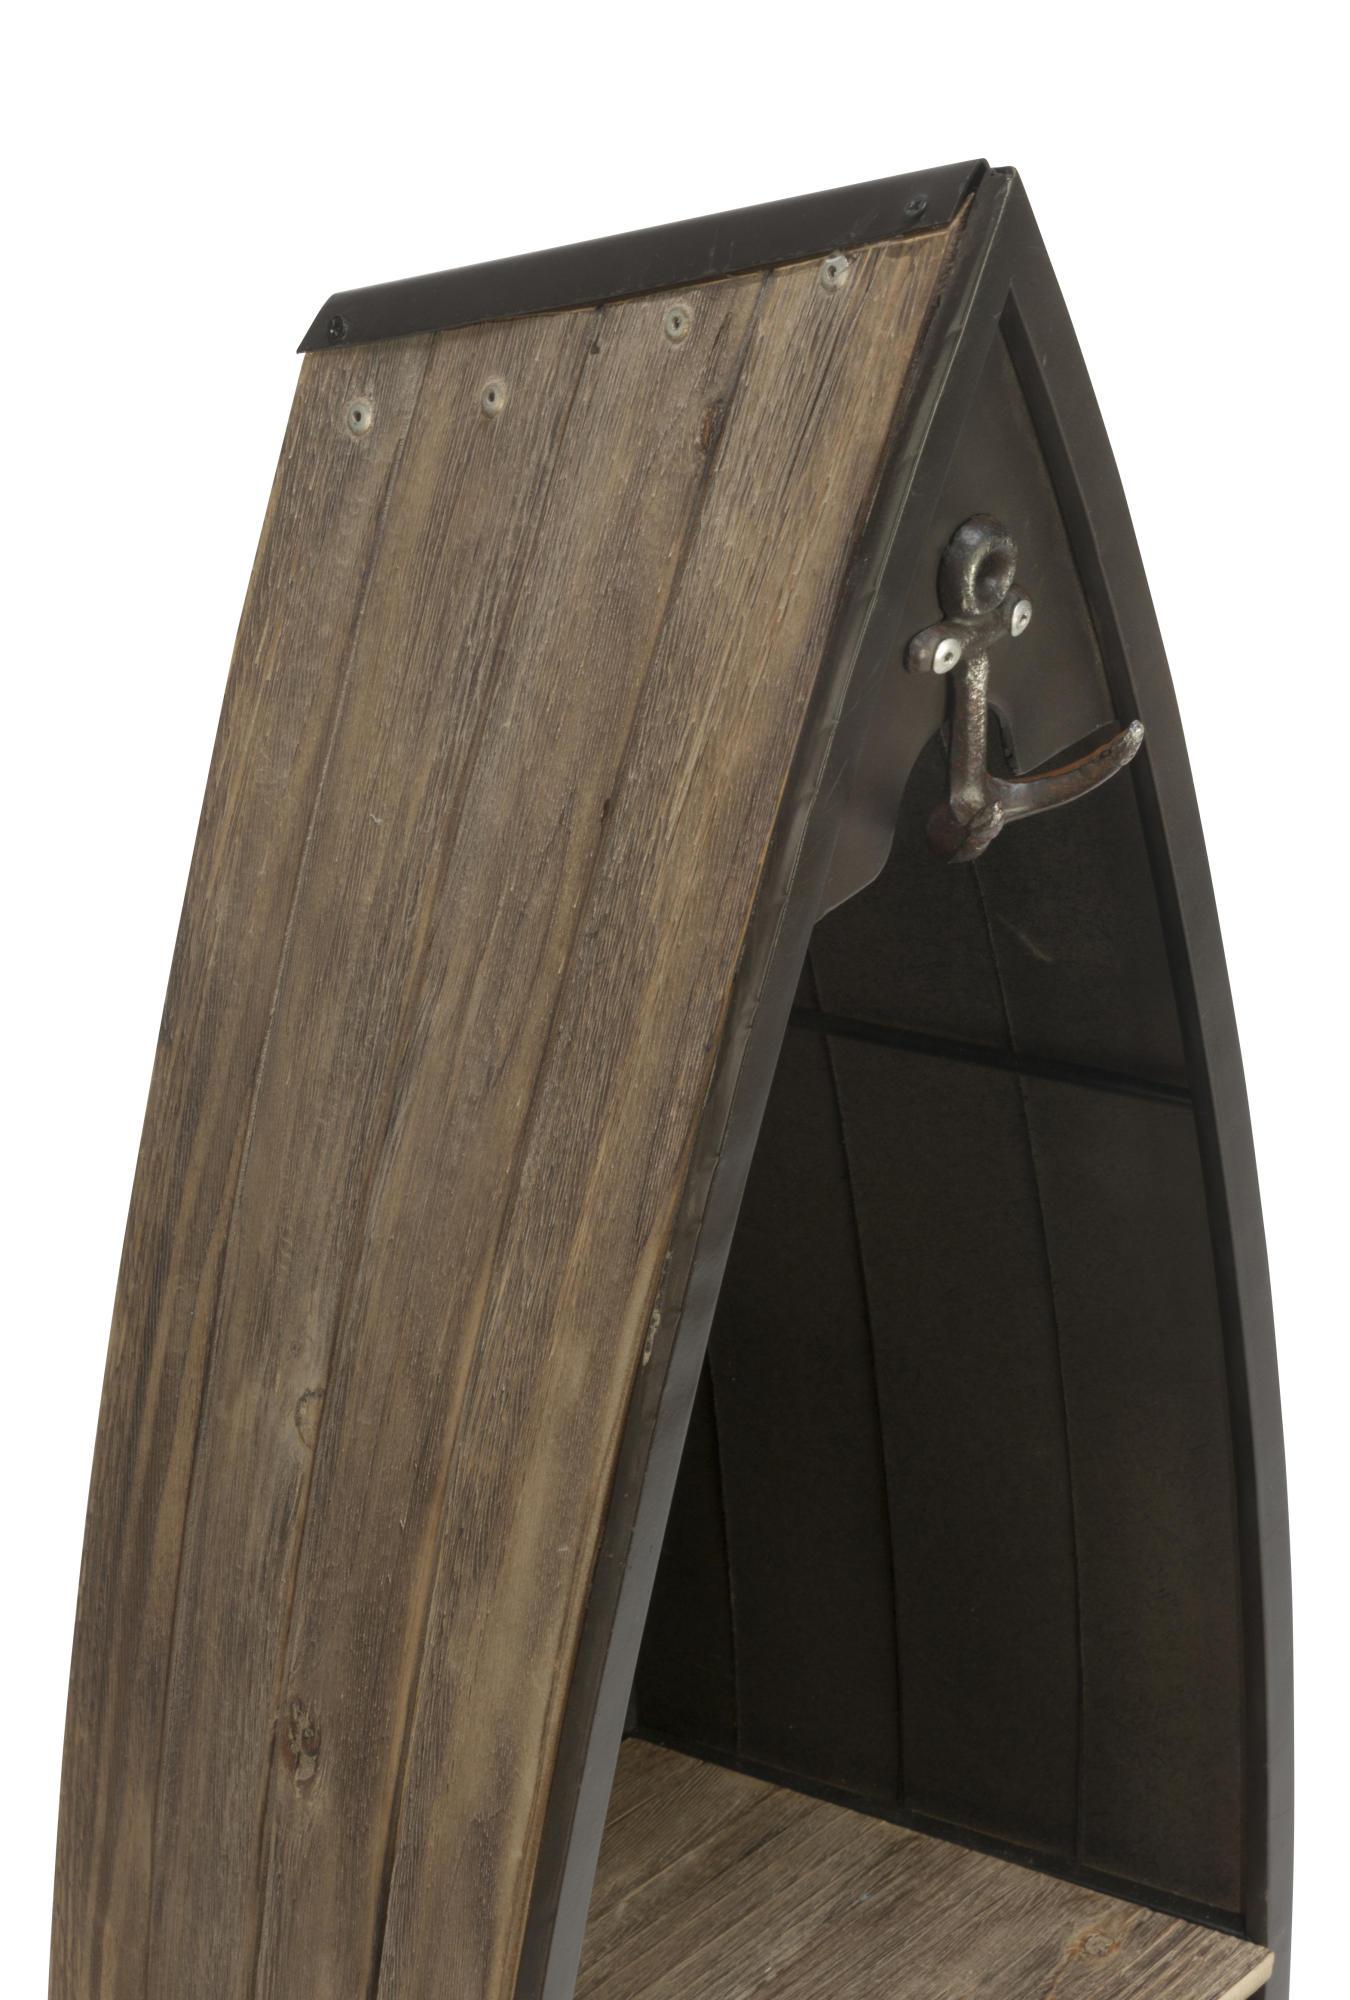 Decorative Wooden Boat Shelves Set Of 2 Tripar